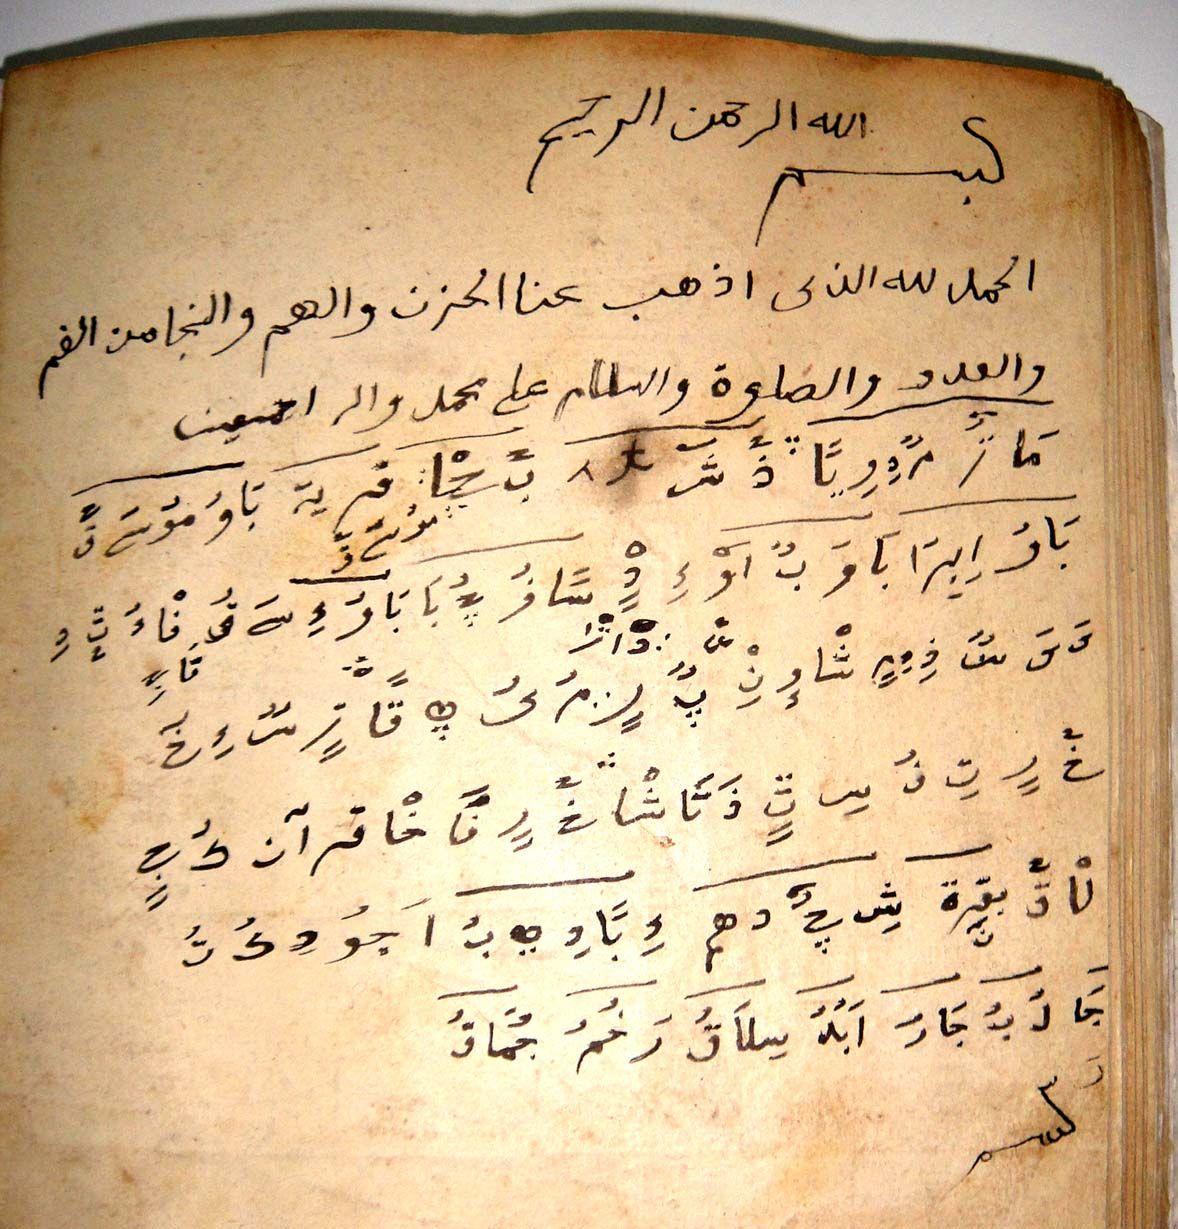 Chinese Quran Ming Qing Dynasty 18th Century Islam In China Qing Dynasty Islamic World